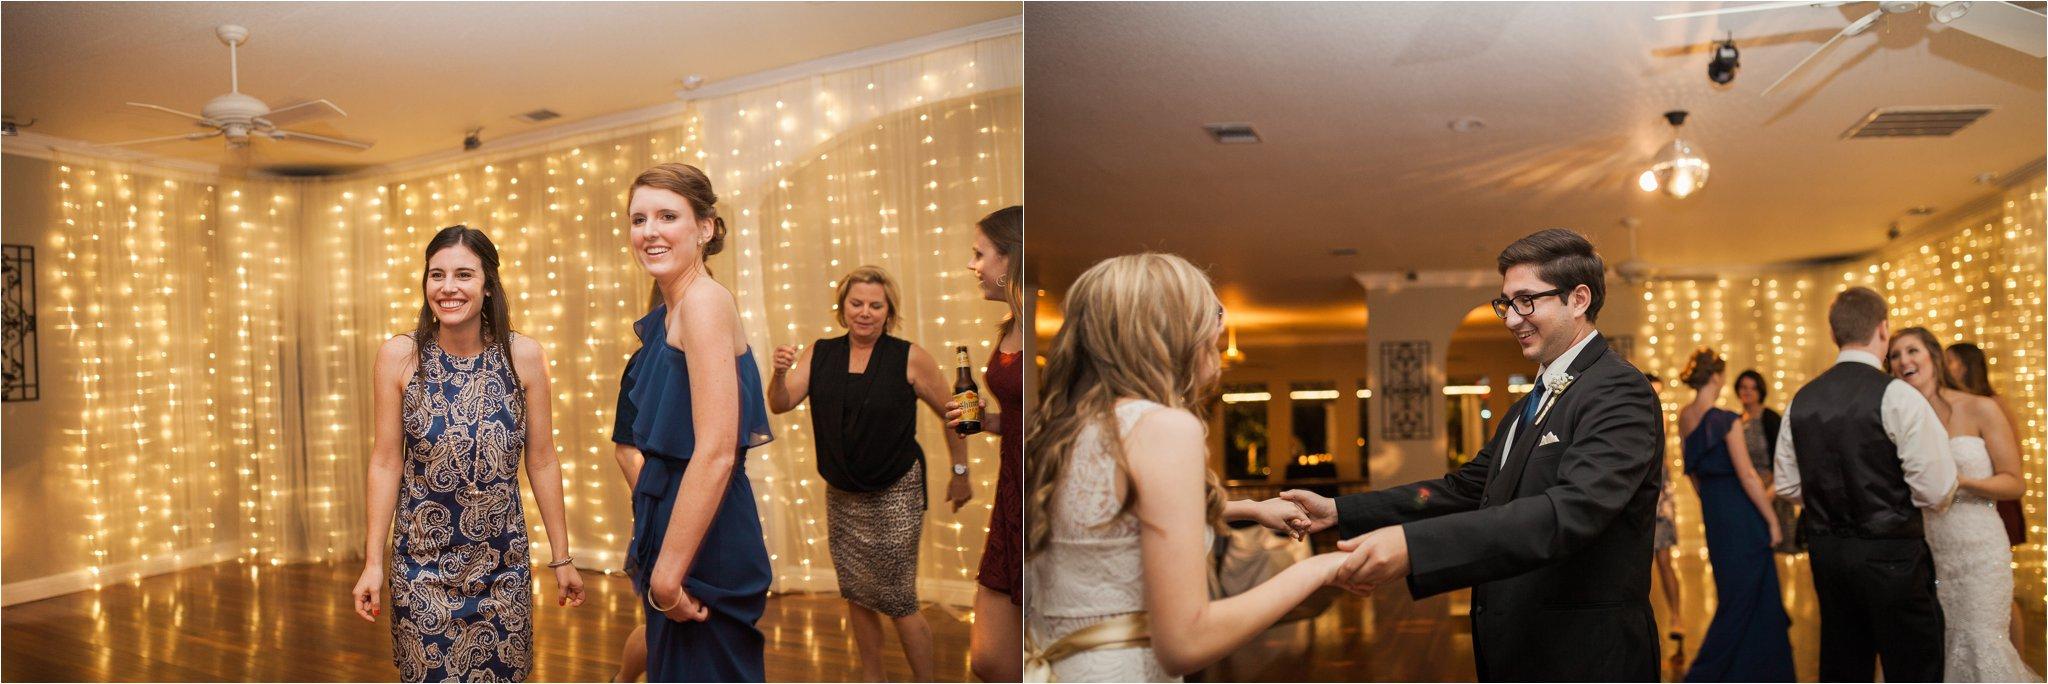 lunsford-wedding-1010.jpg